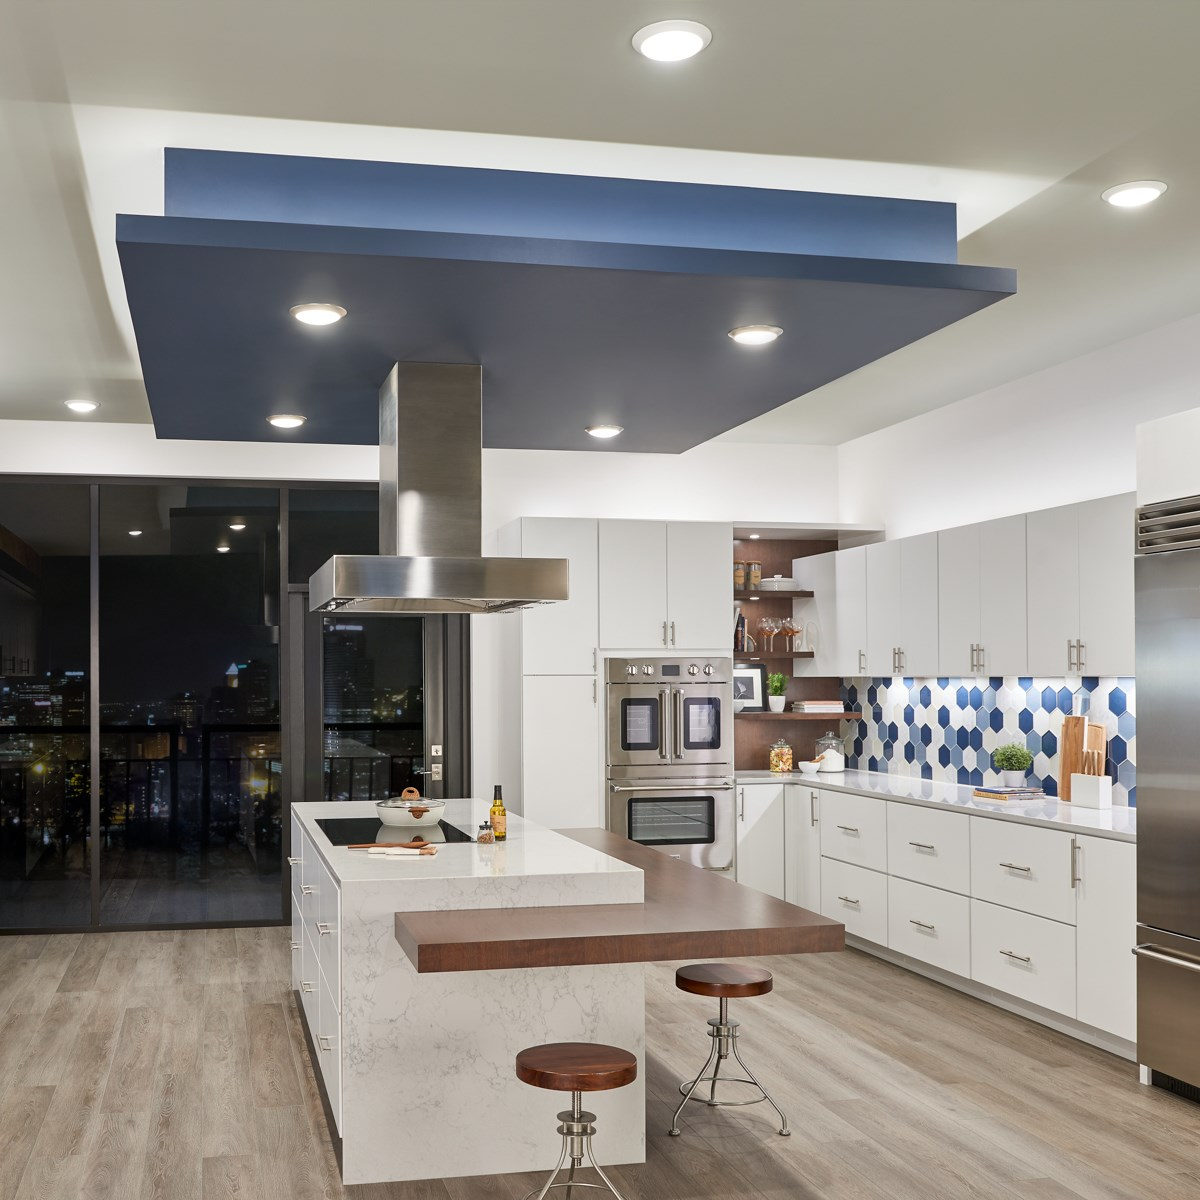 "4U 22"" 3000K LED Cabinet Light Textured White | Kichler ..."